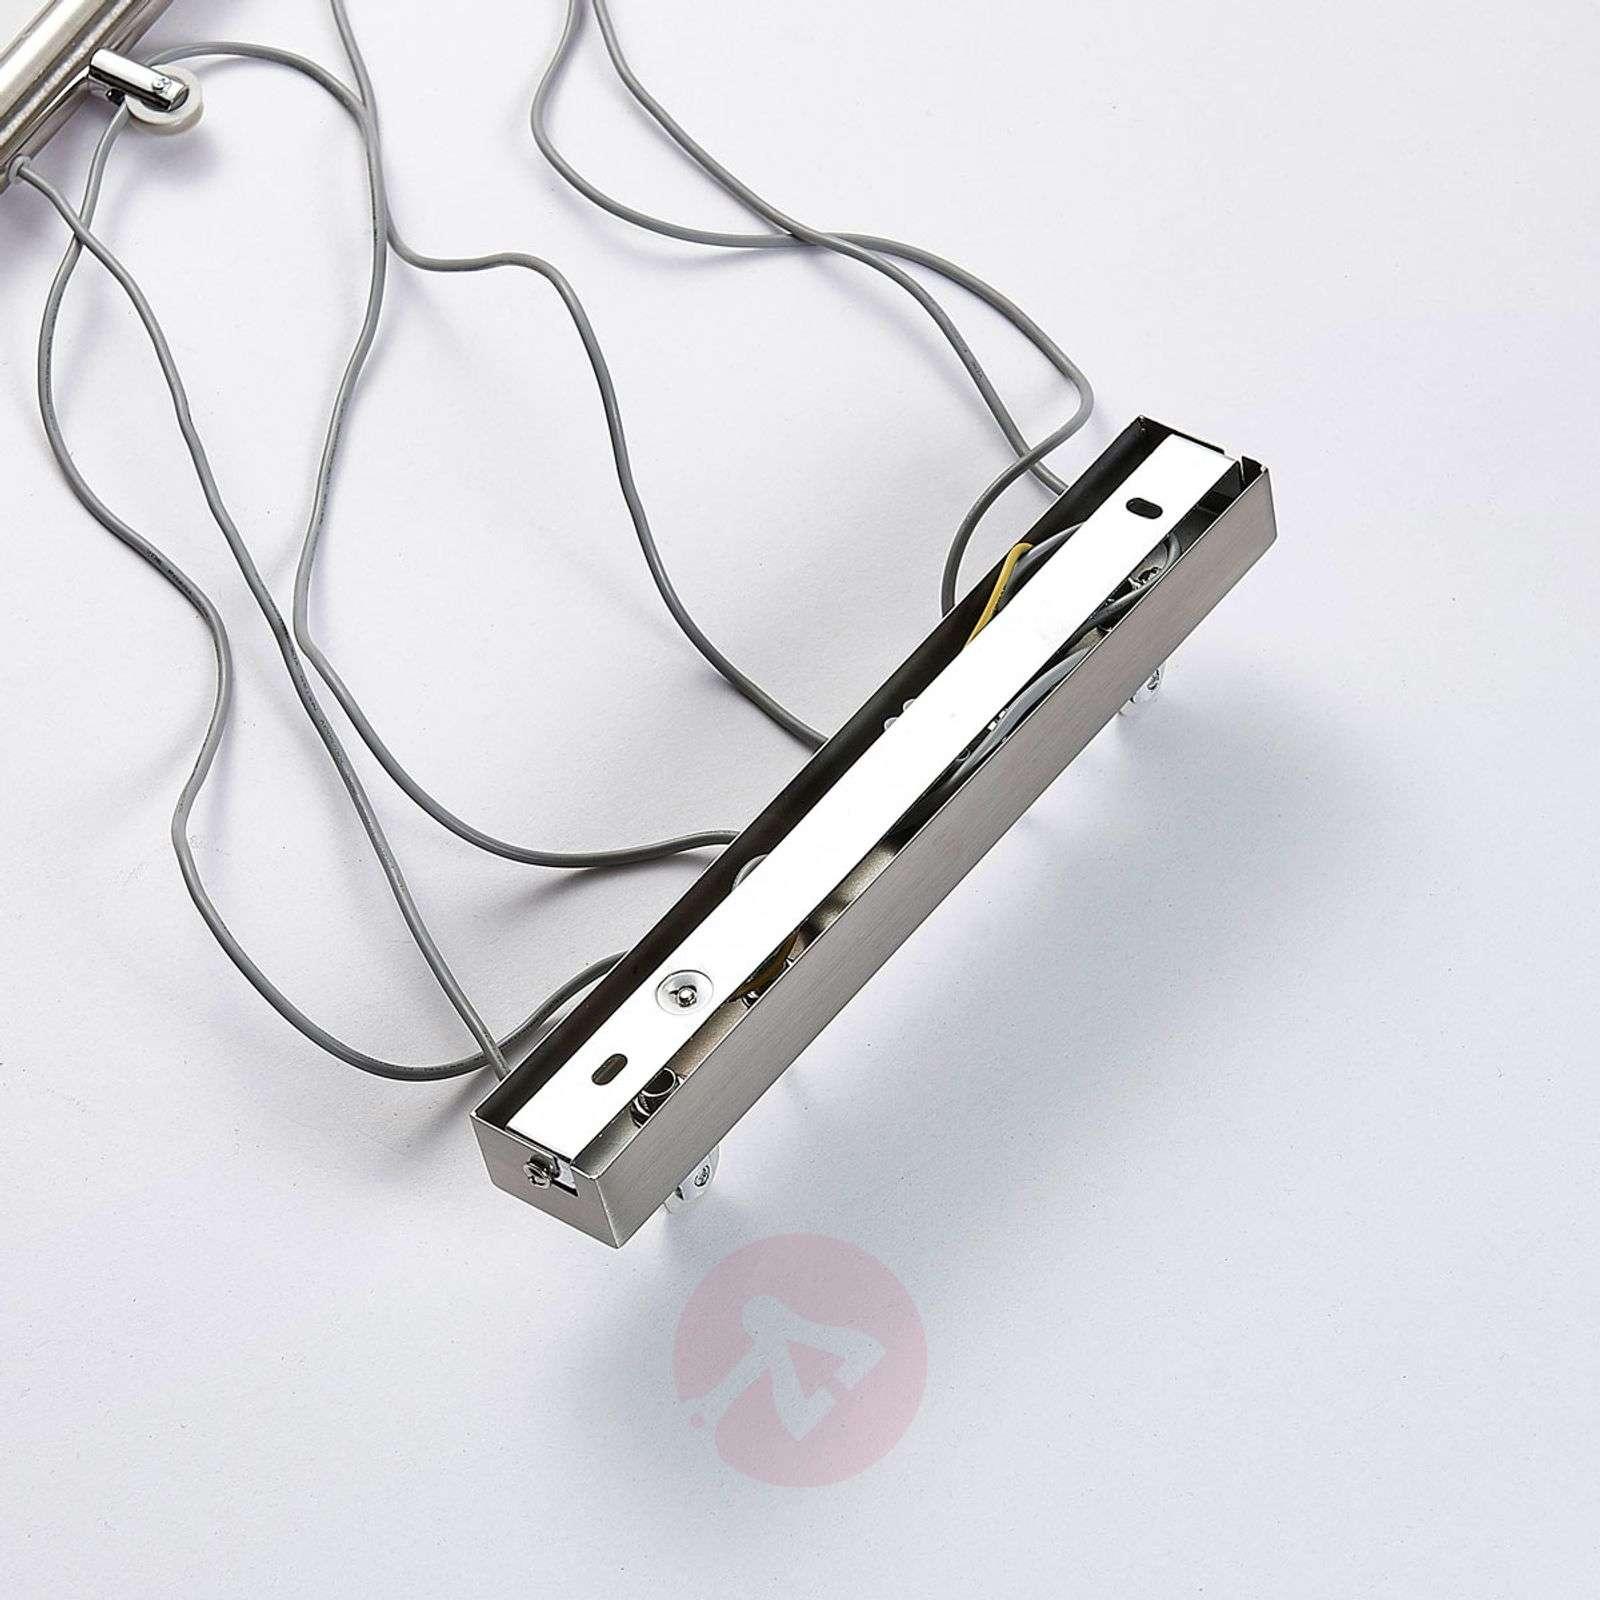 LED-riippuvalo Eleasa, easydim, 5-sarja, nikkeli-9621388-02